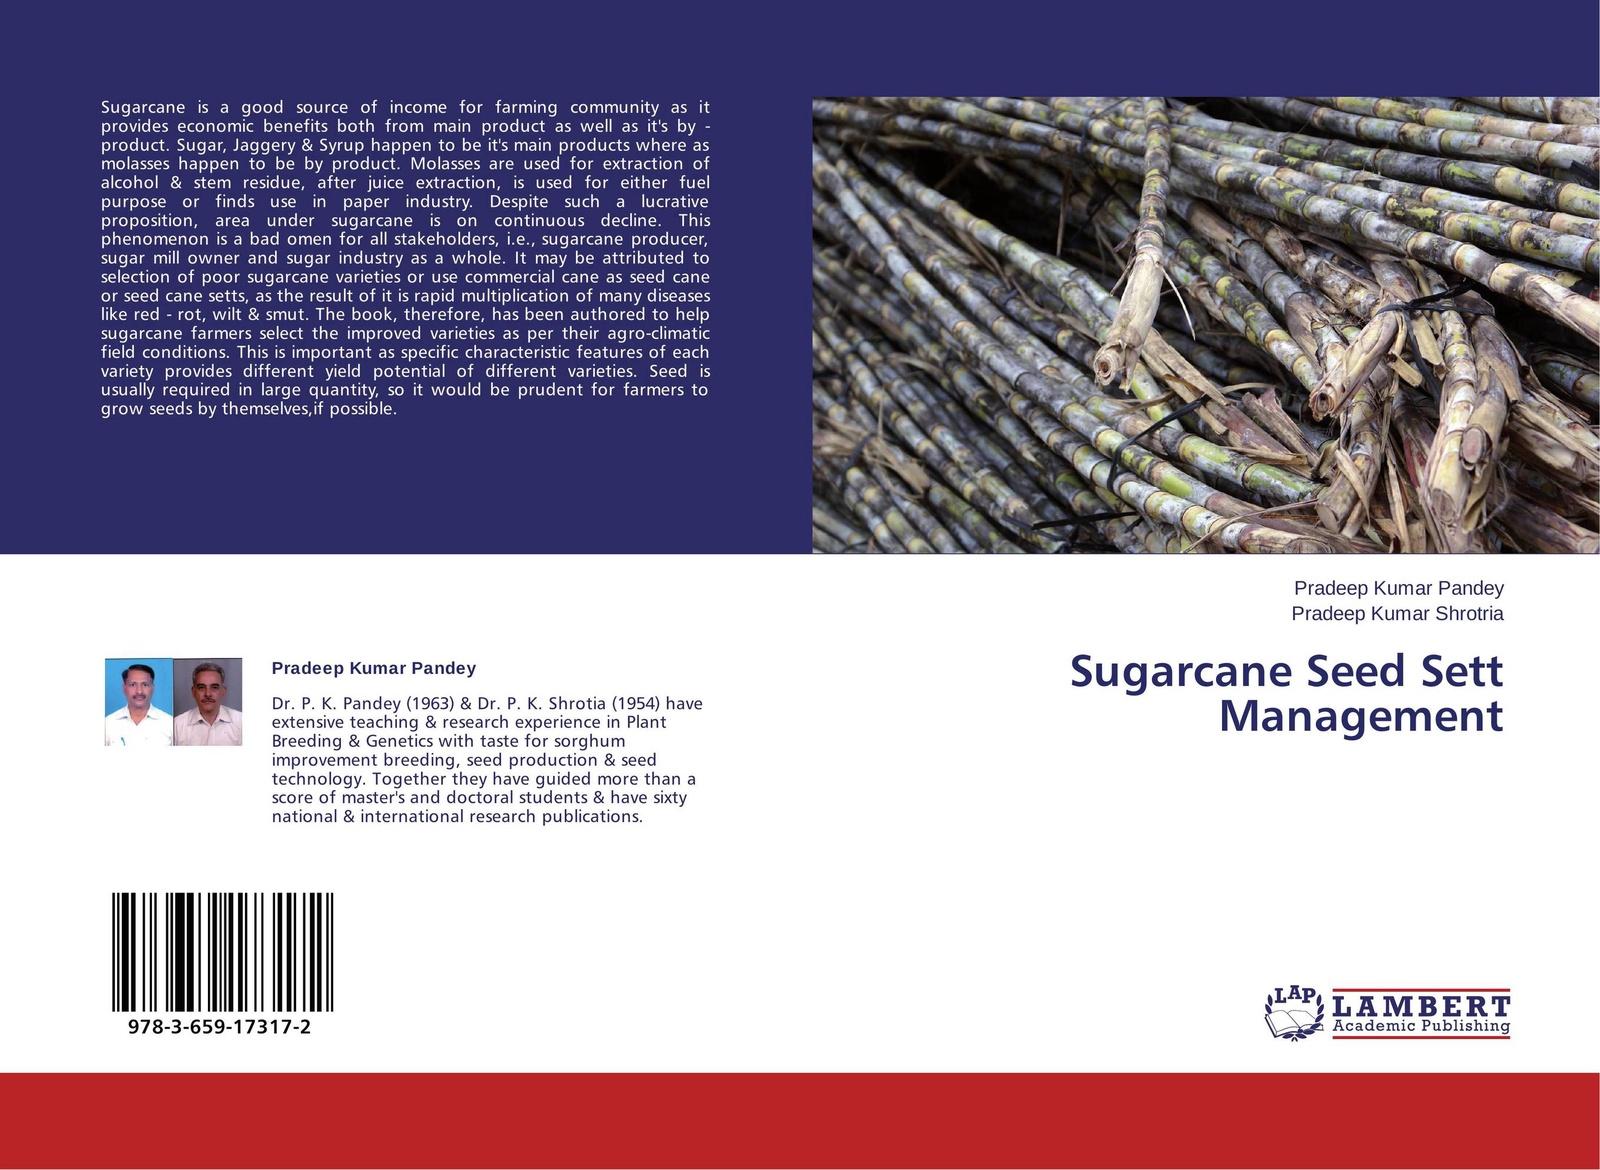 Pradeep Kumar Pandey and Pradeep Kumar Shrotria Sugarcane Seed Sett Management цена и фото